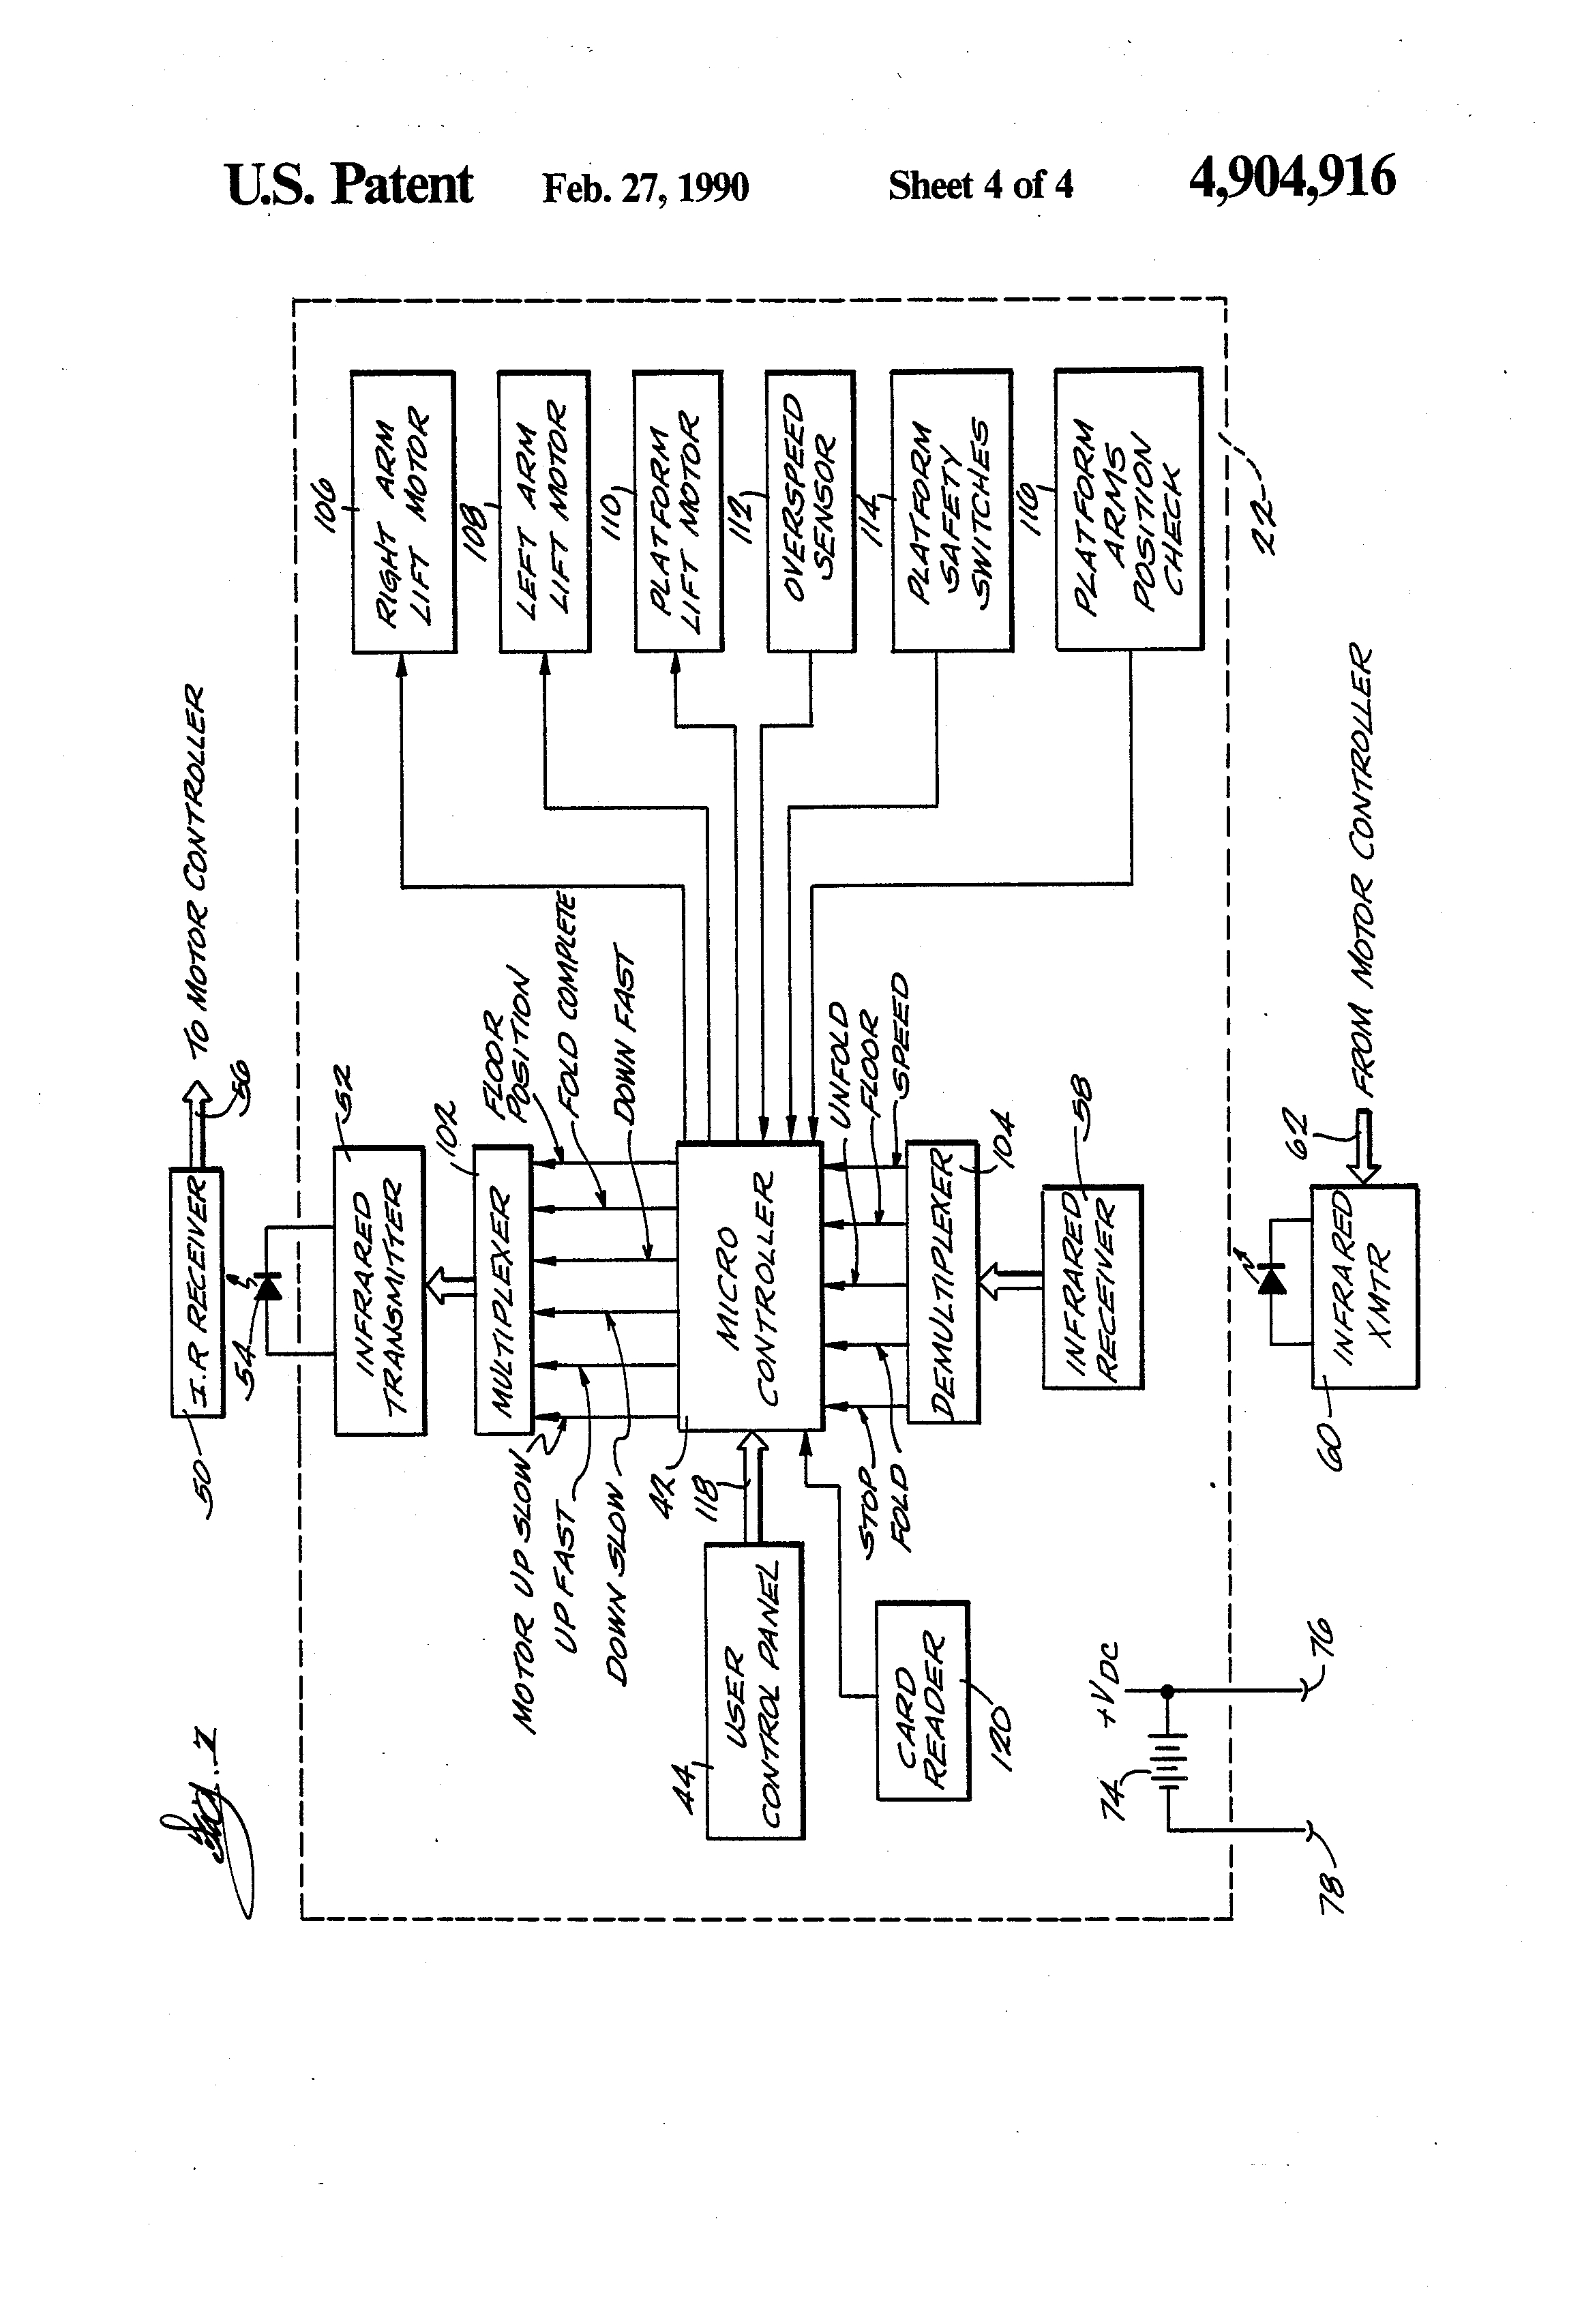 Quantum 600 Wheelchair Wiring Diagram